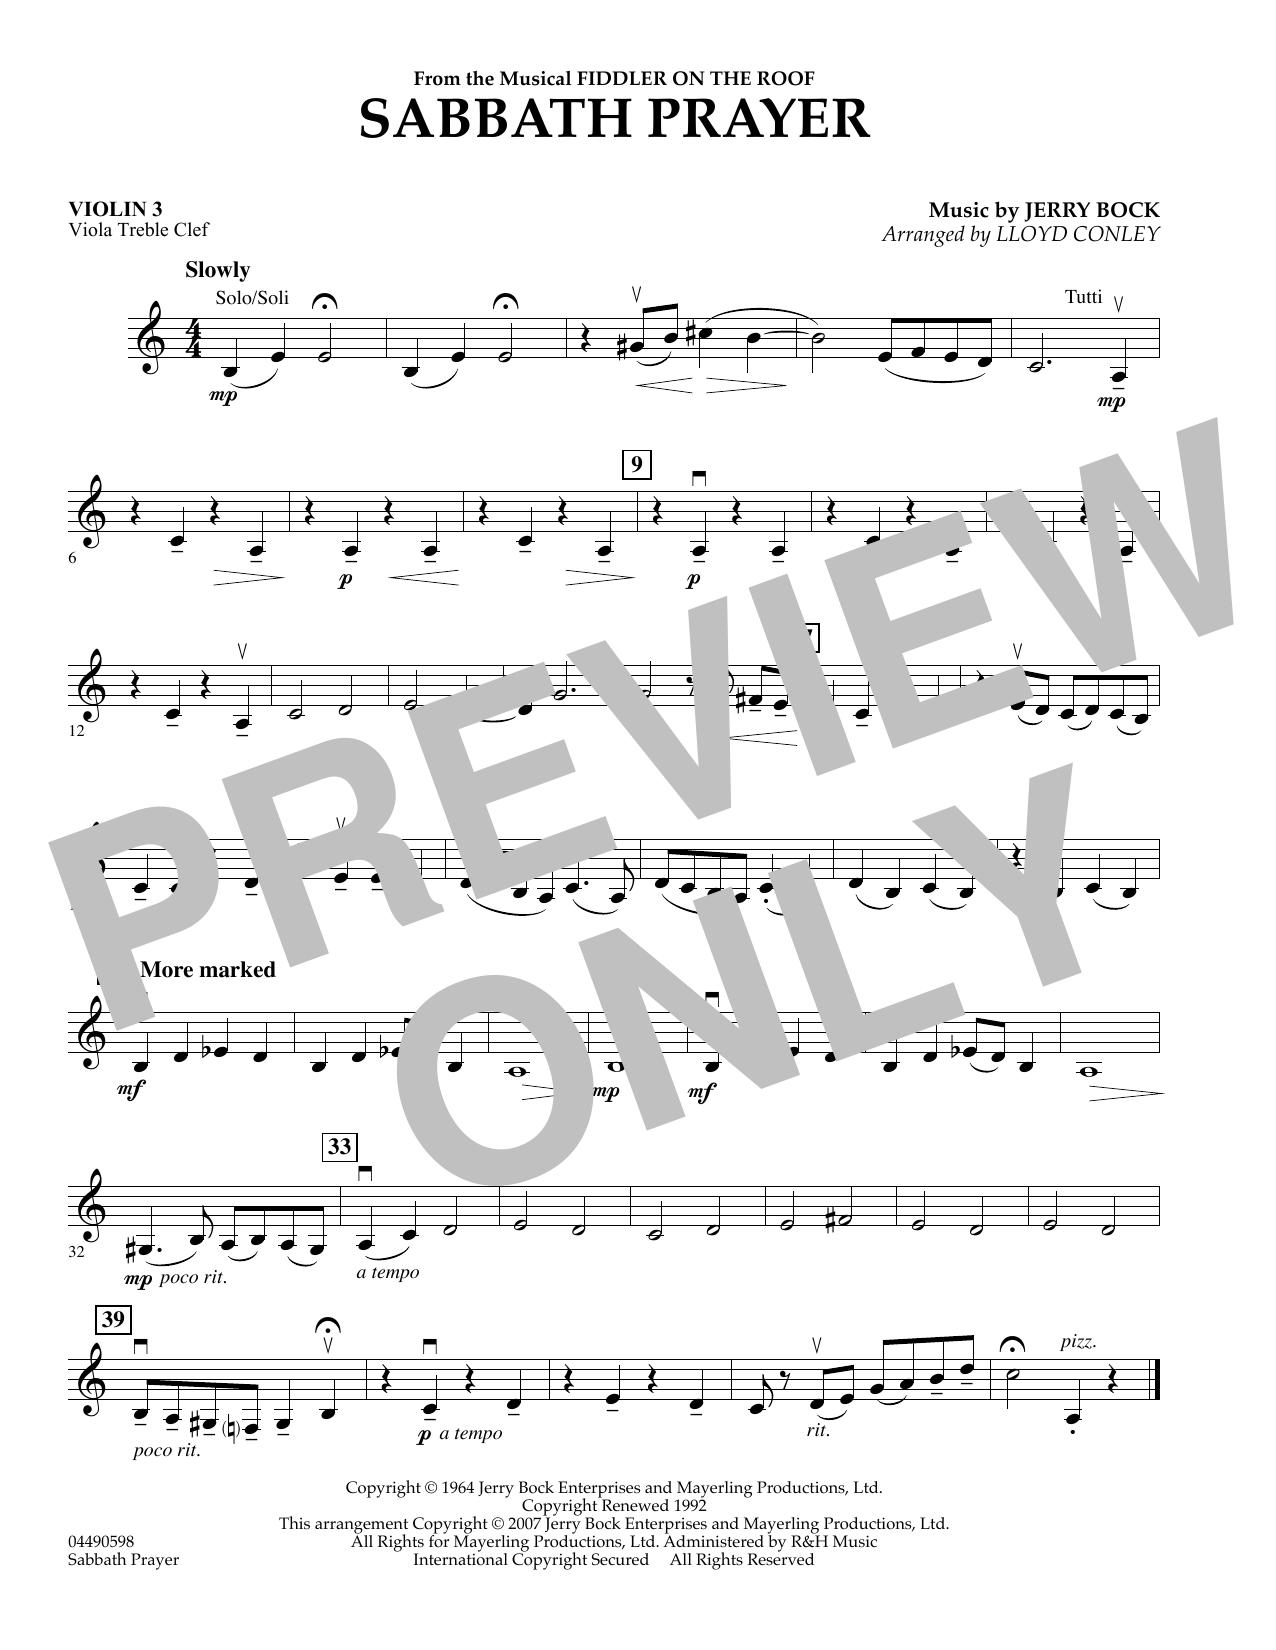 Sabbath Prayer - Violin 3 (Viola T.C.) (Orchestra)